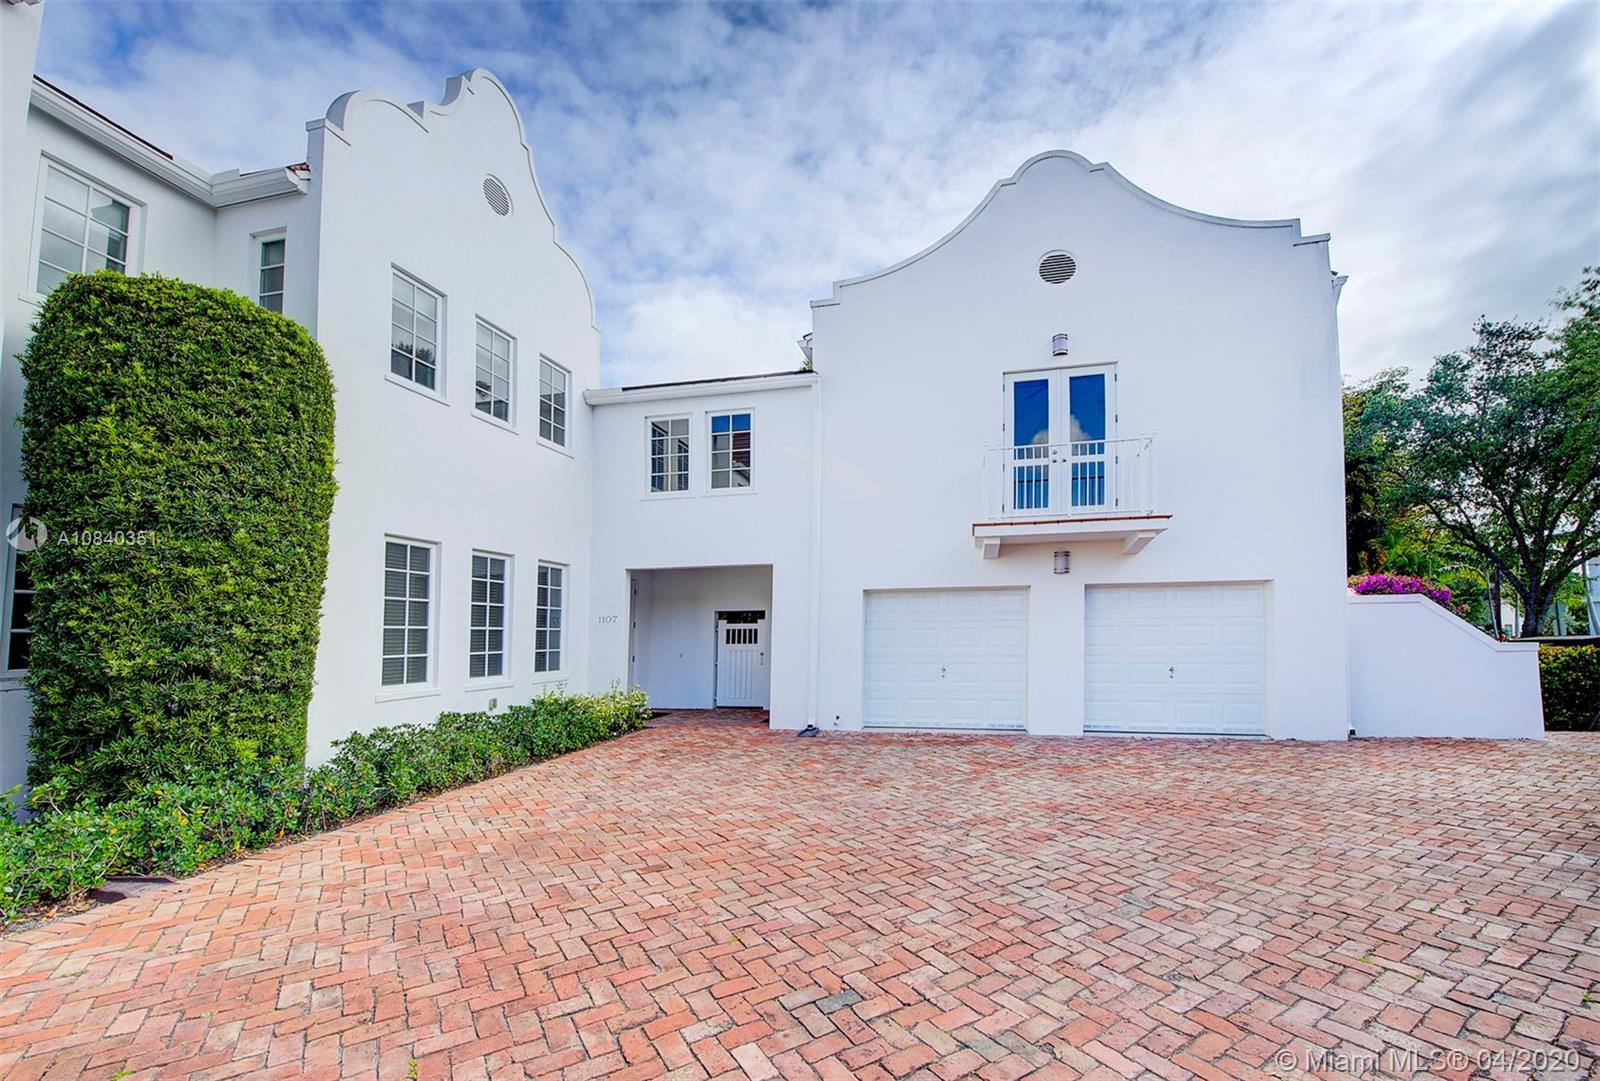 1107 Campo Sano Ave # 1, Coral Gables, Florida 33146, 4 Bedrooms Bedrooms, ,5 BathroomsBathrooms,Residential,For Sale,1107 Campo Sano Ave # 1,A10840351